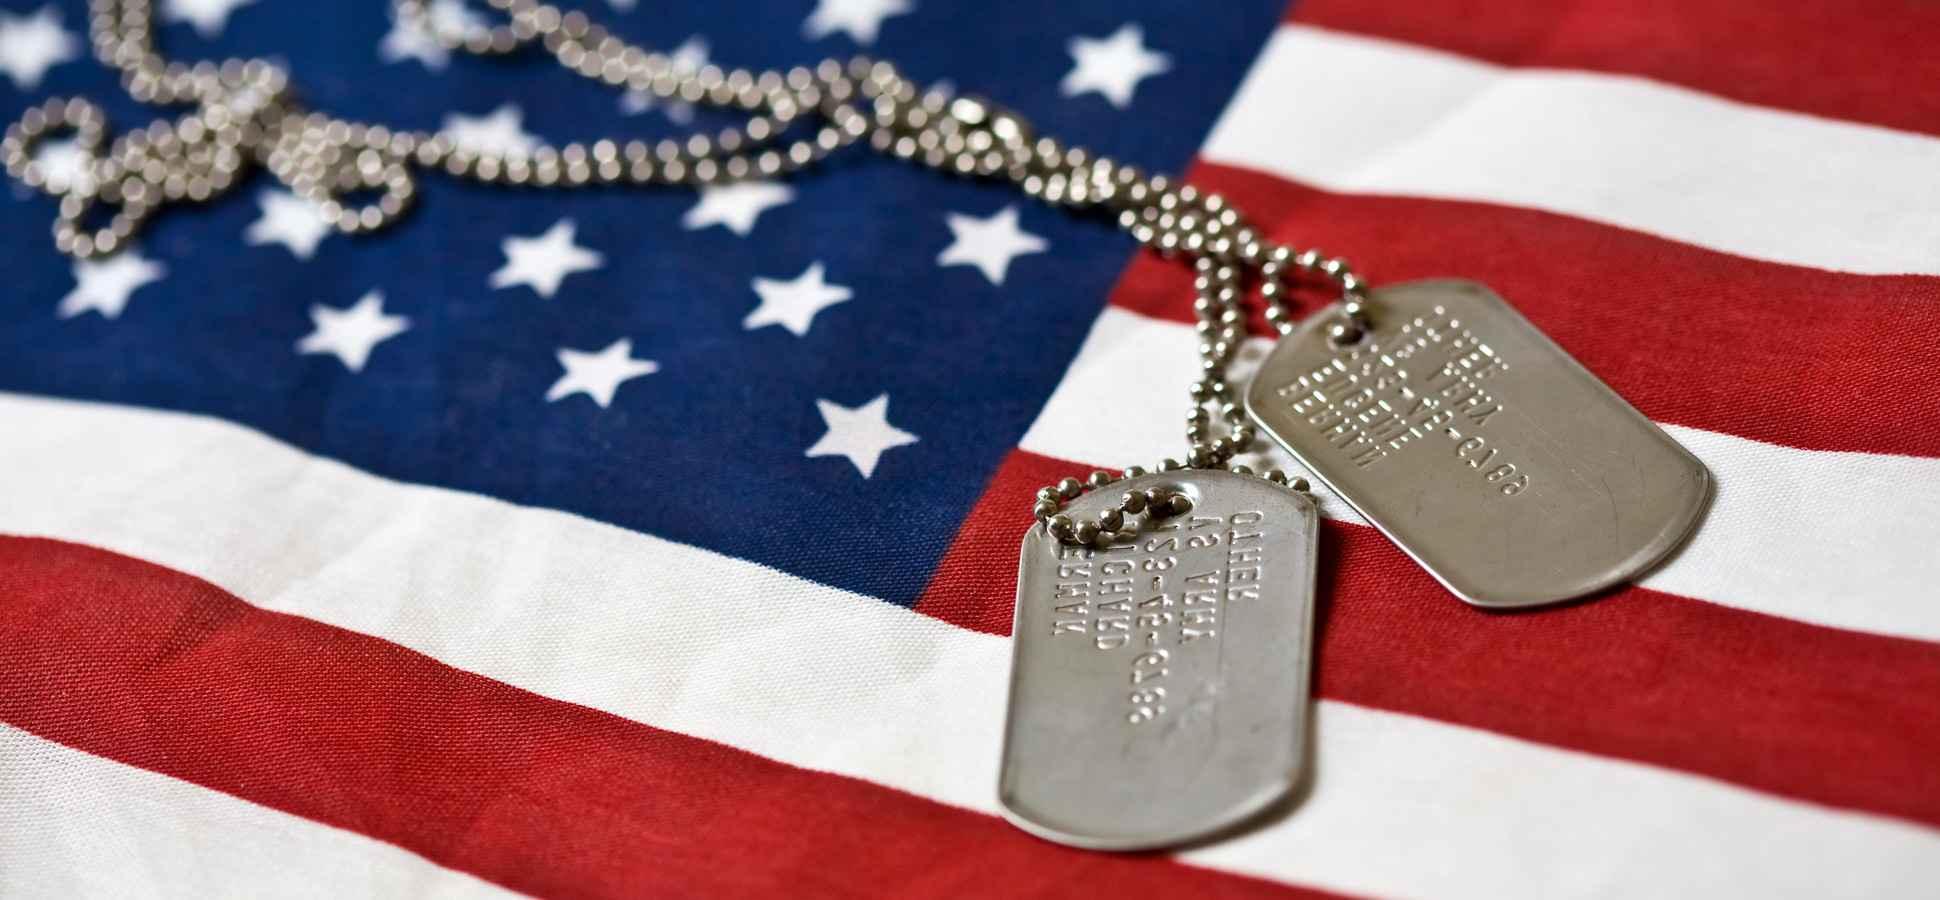 Why Do Military Veterans Make Such Great Entrepreneurs?